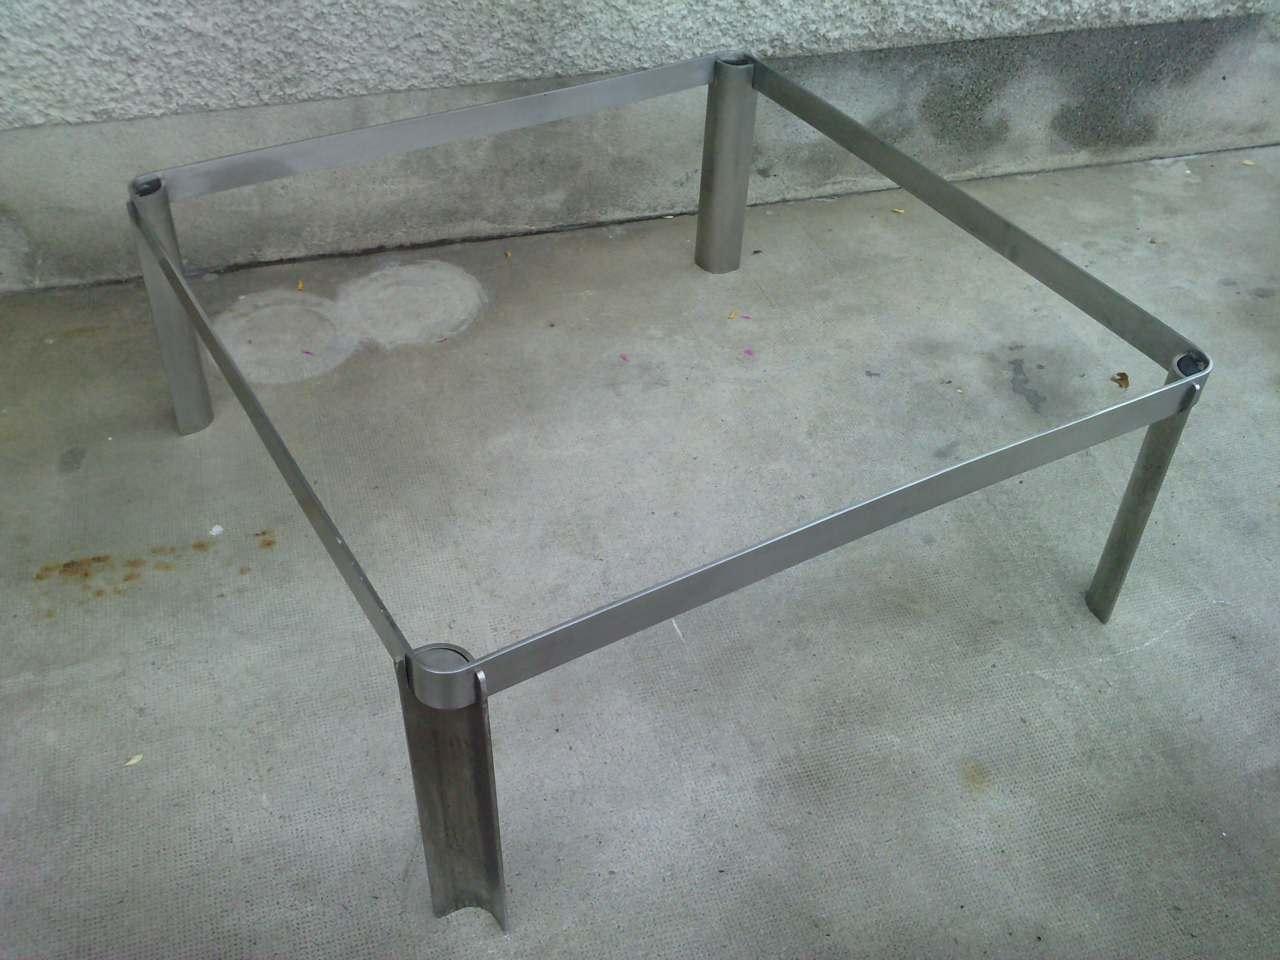 Grande Table Basse Chrome Design 70 Coffee Tavolo Inox Eur 260 00 Picclick Fr